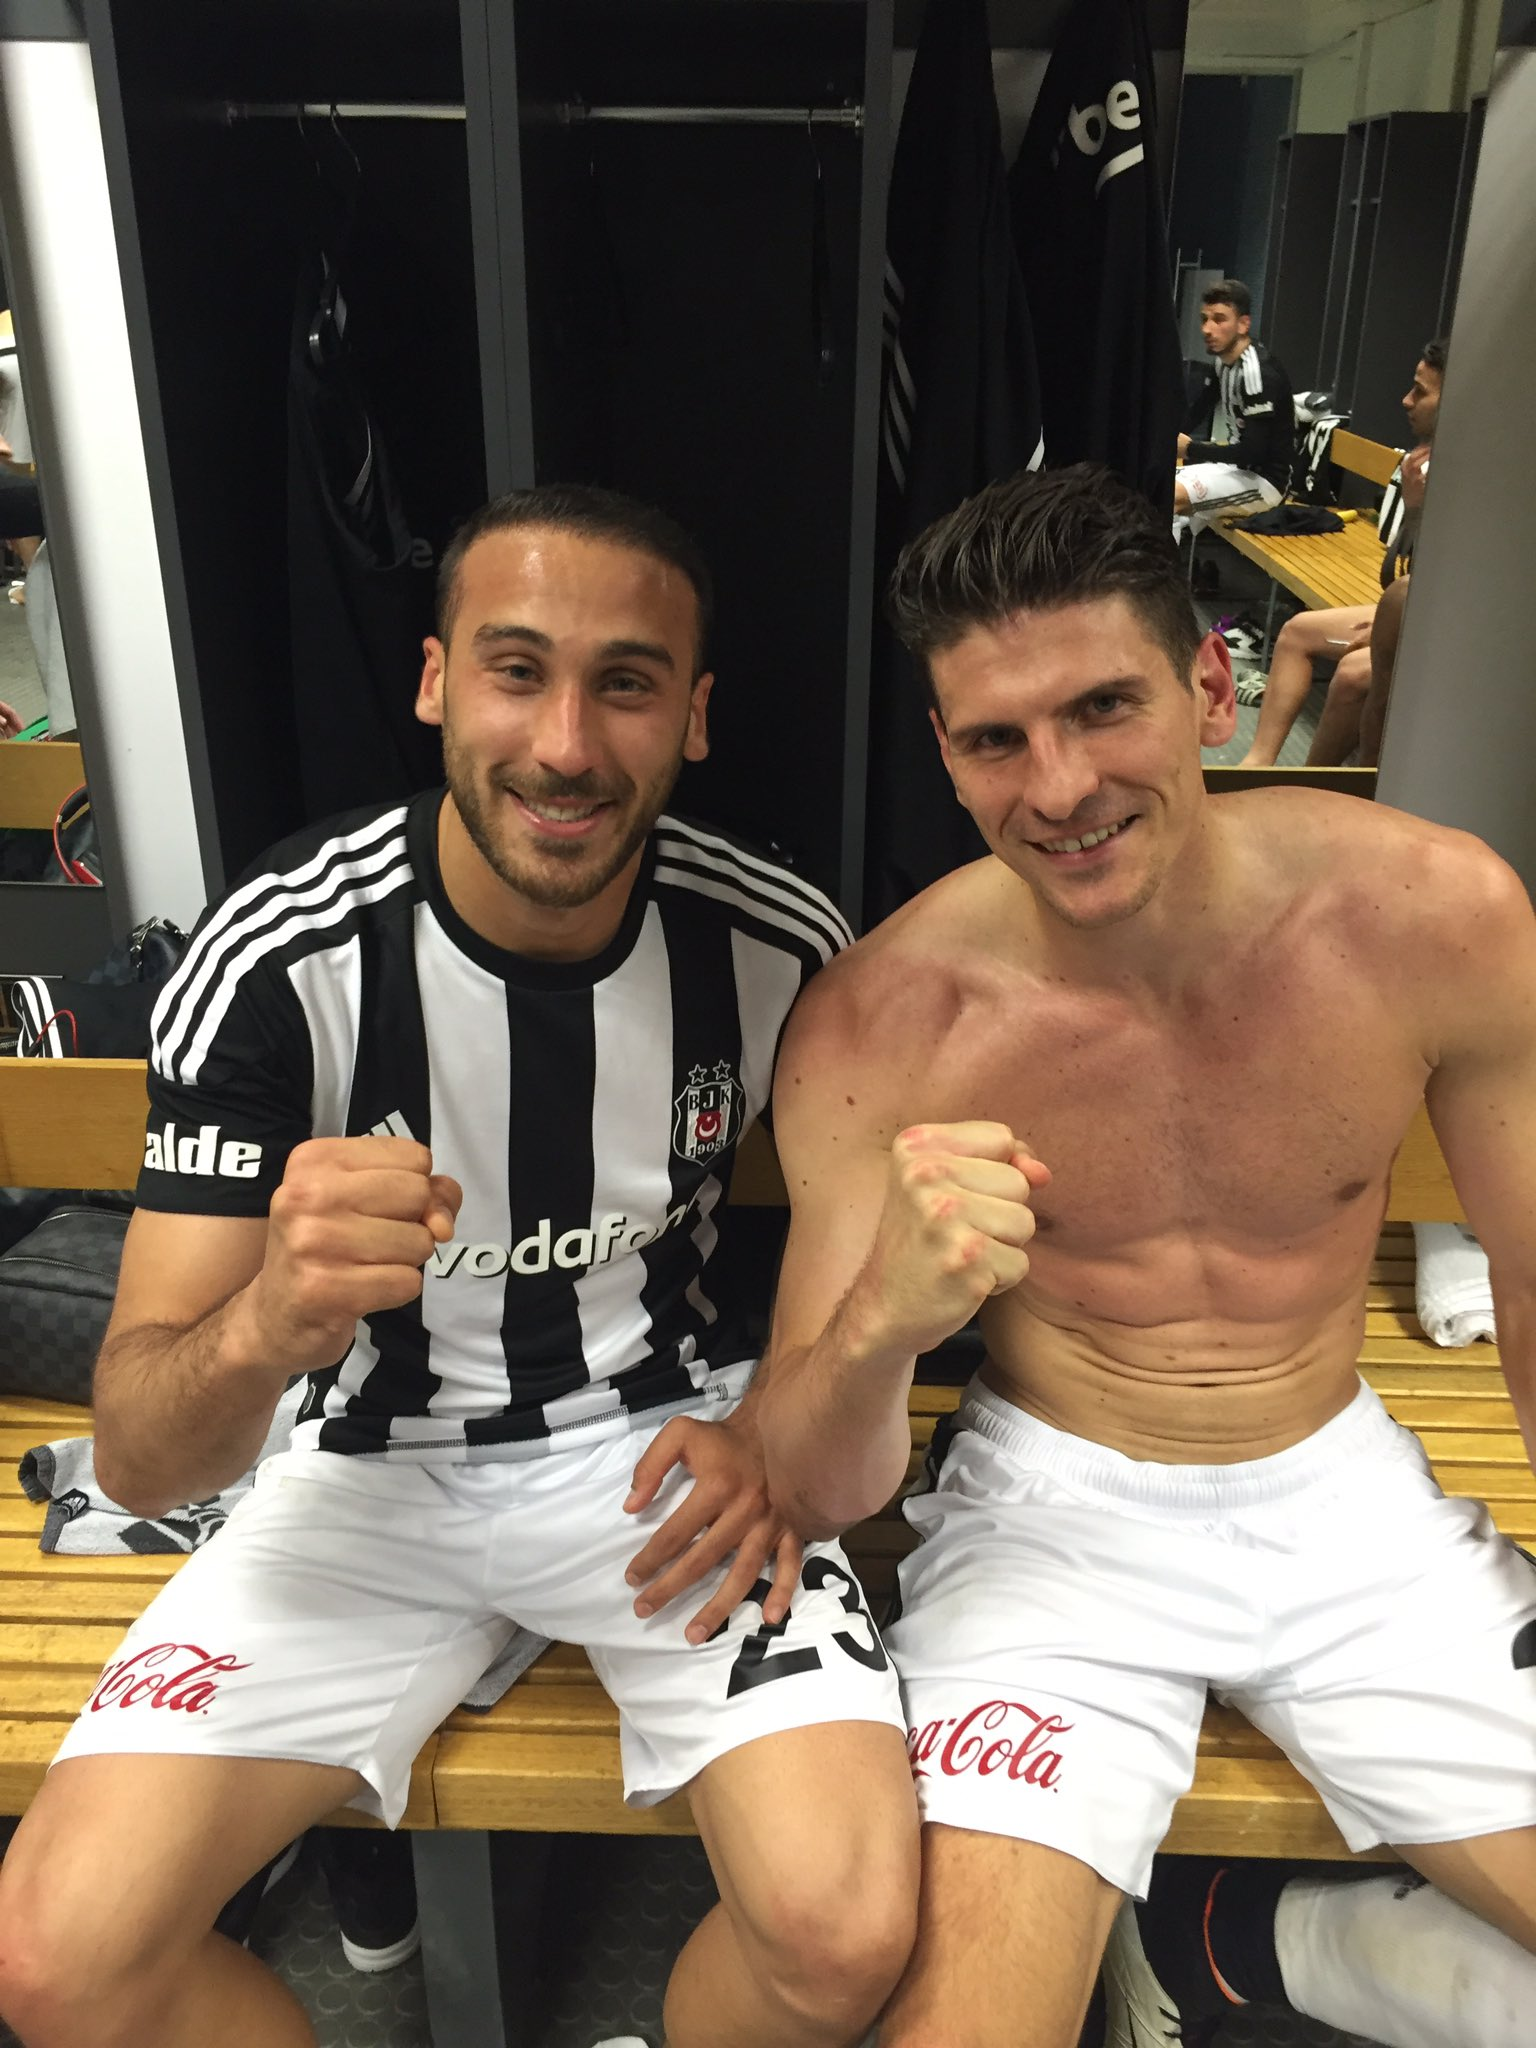 Bu galibiyet ANNE'LERİMİZE !!! ⚽️⚫️⚪️ #gururlan #Beşiktaş #kartal https://t.co/YrSvp0pzrl